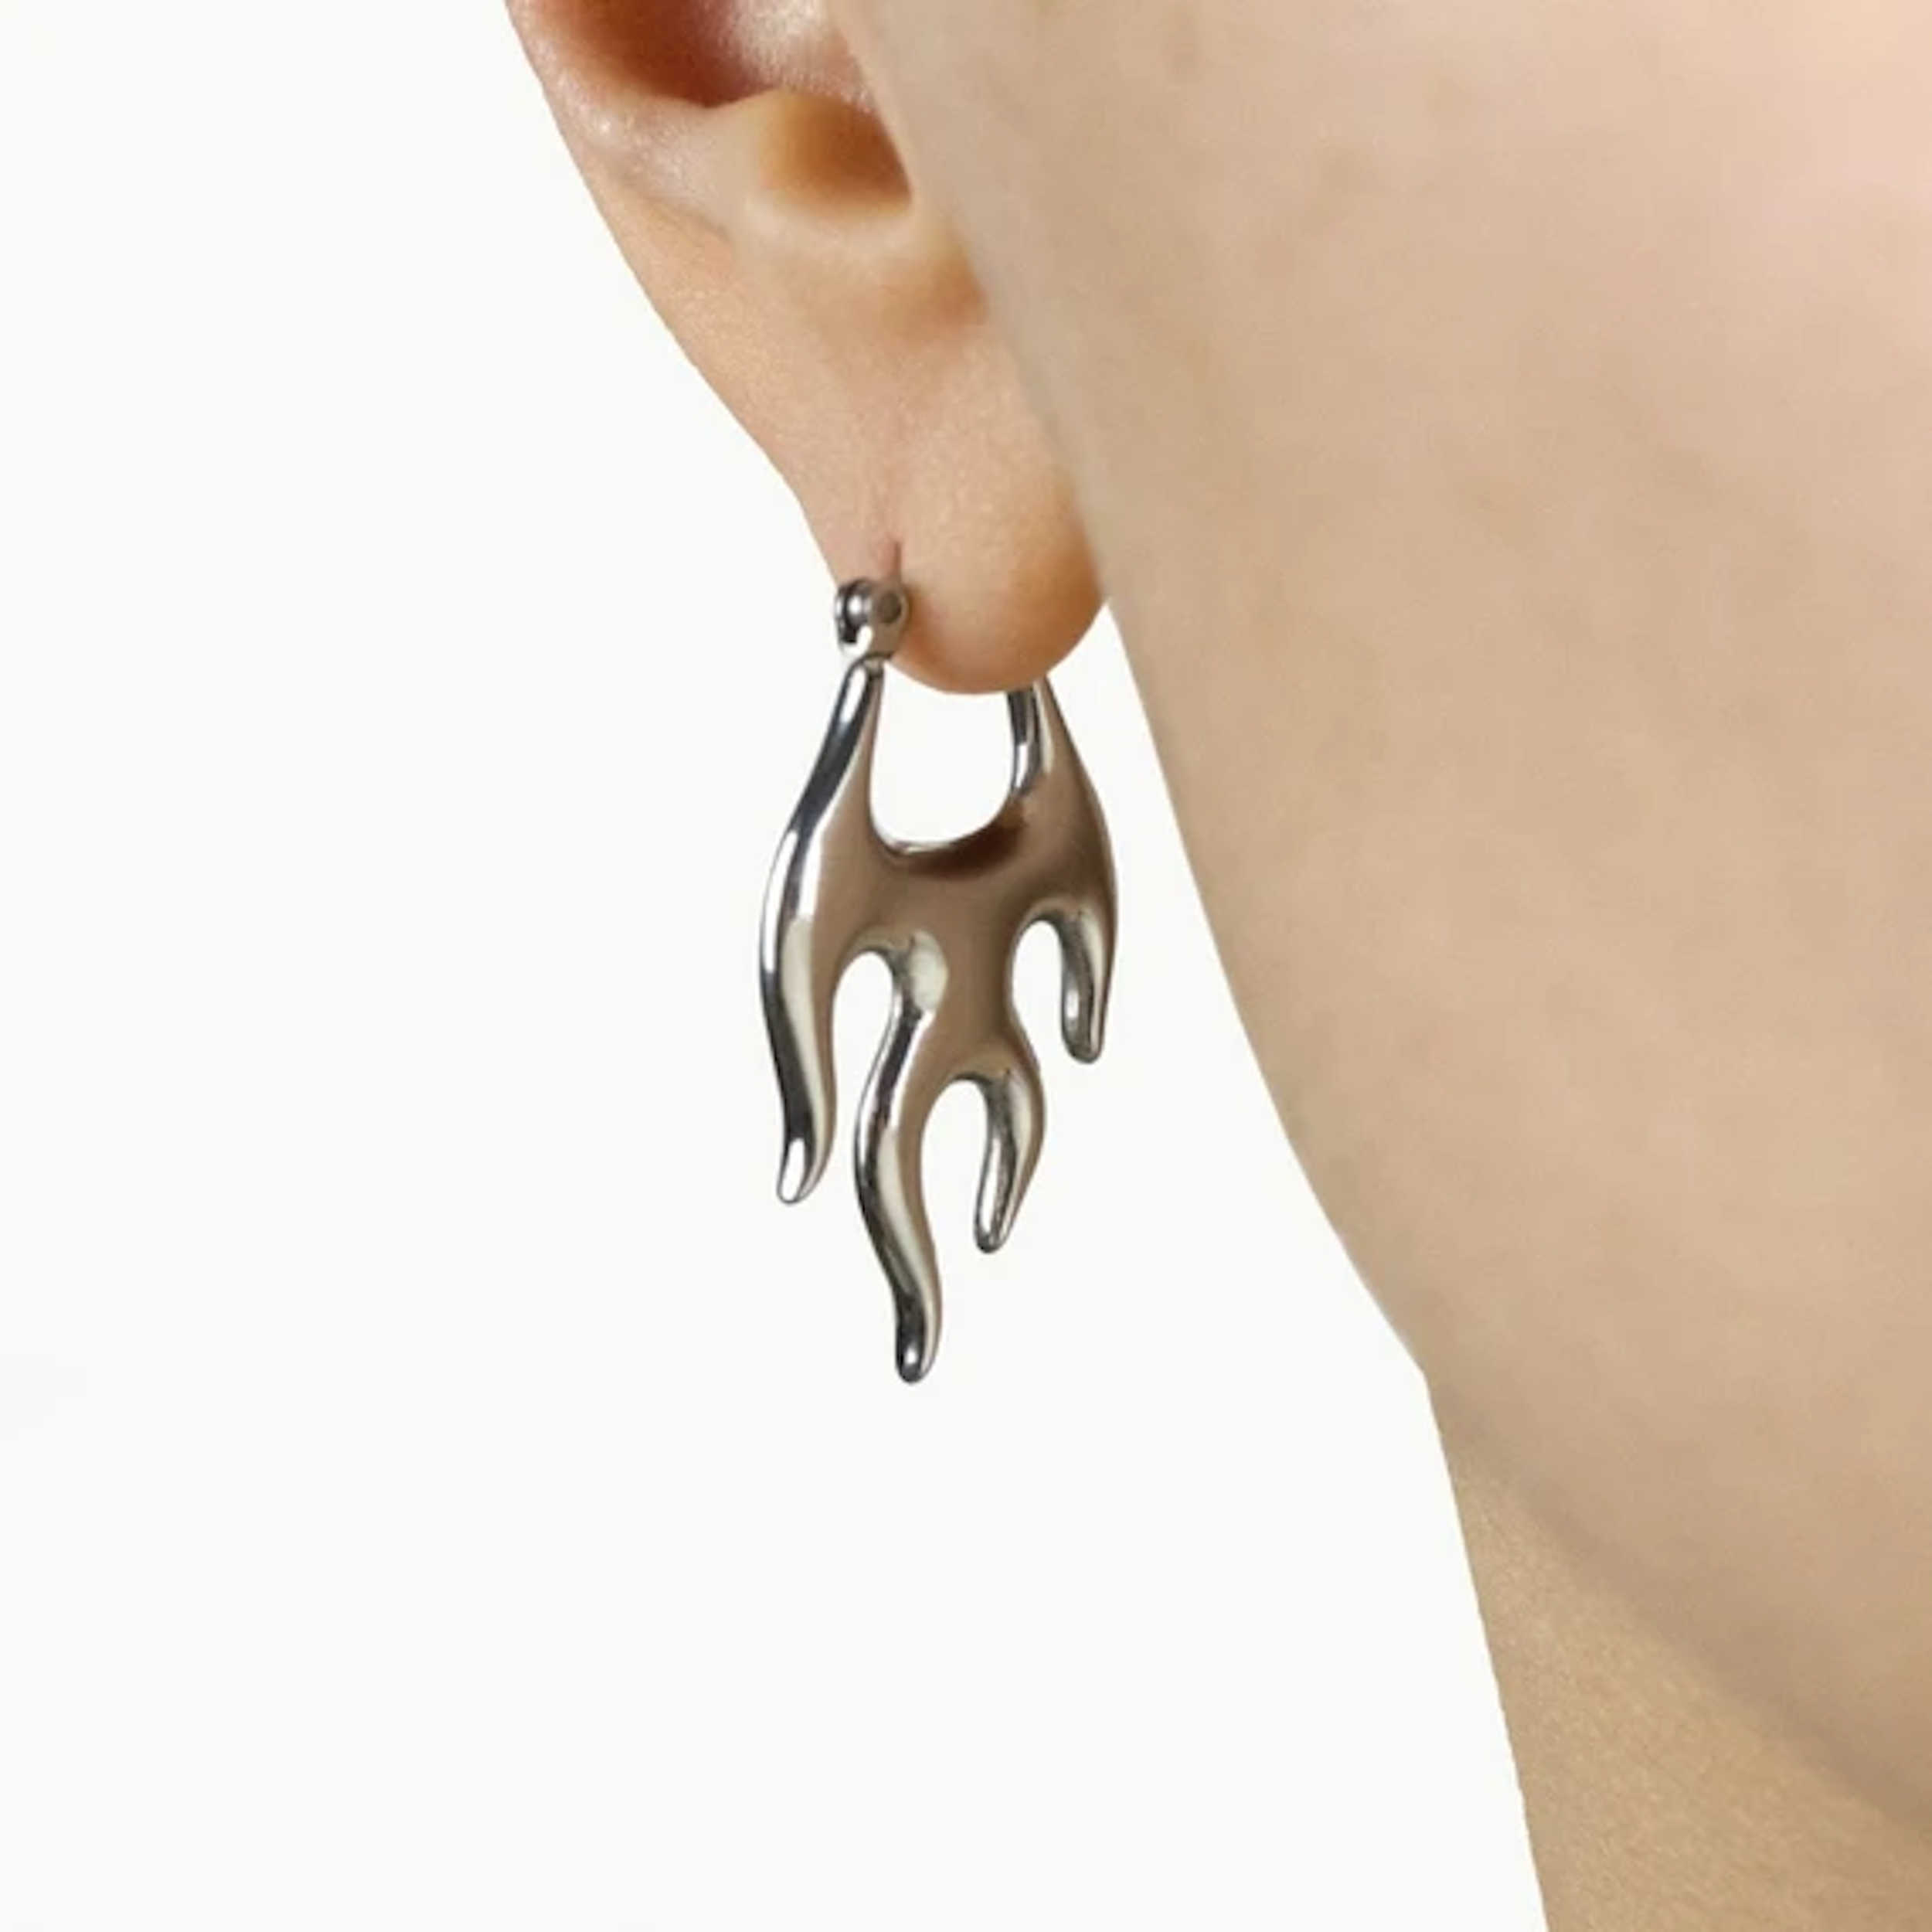 Studio Cult earrings